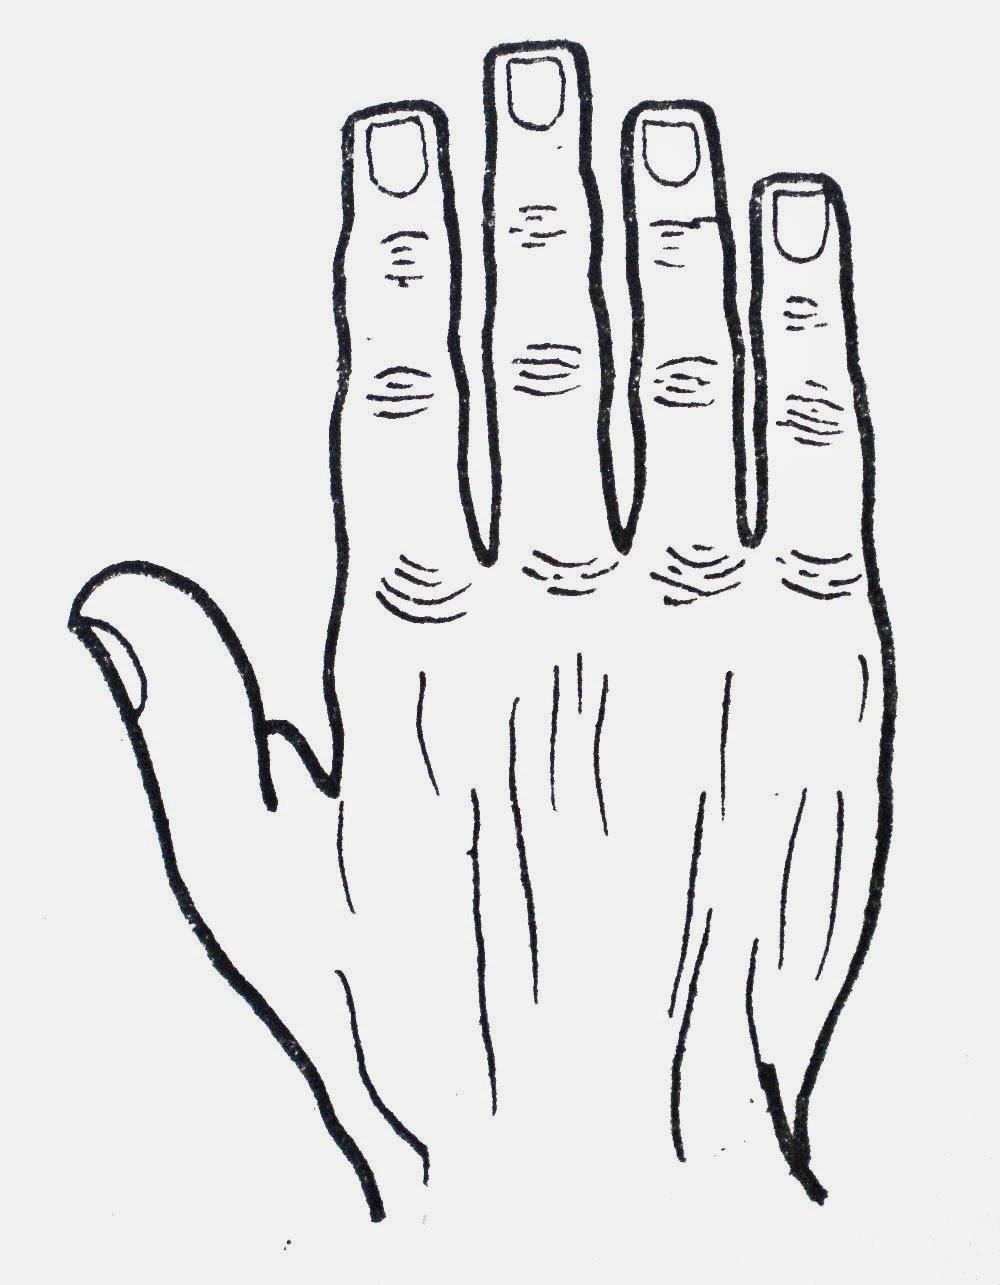 Hand Prediction ทำนายลายมือ: มือสี่เหลี่ยมจตุรัสหรือมือ